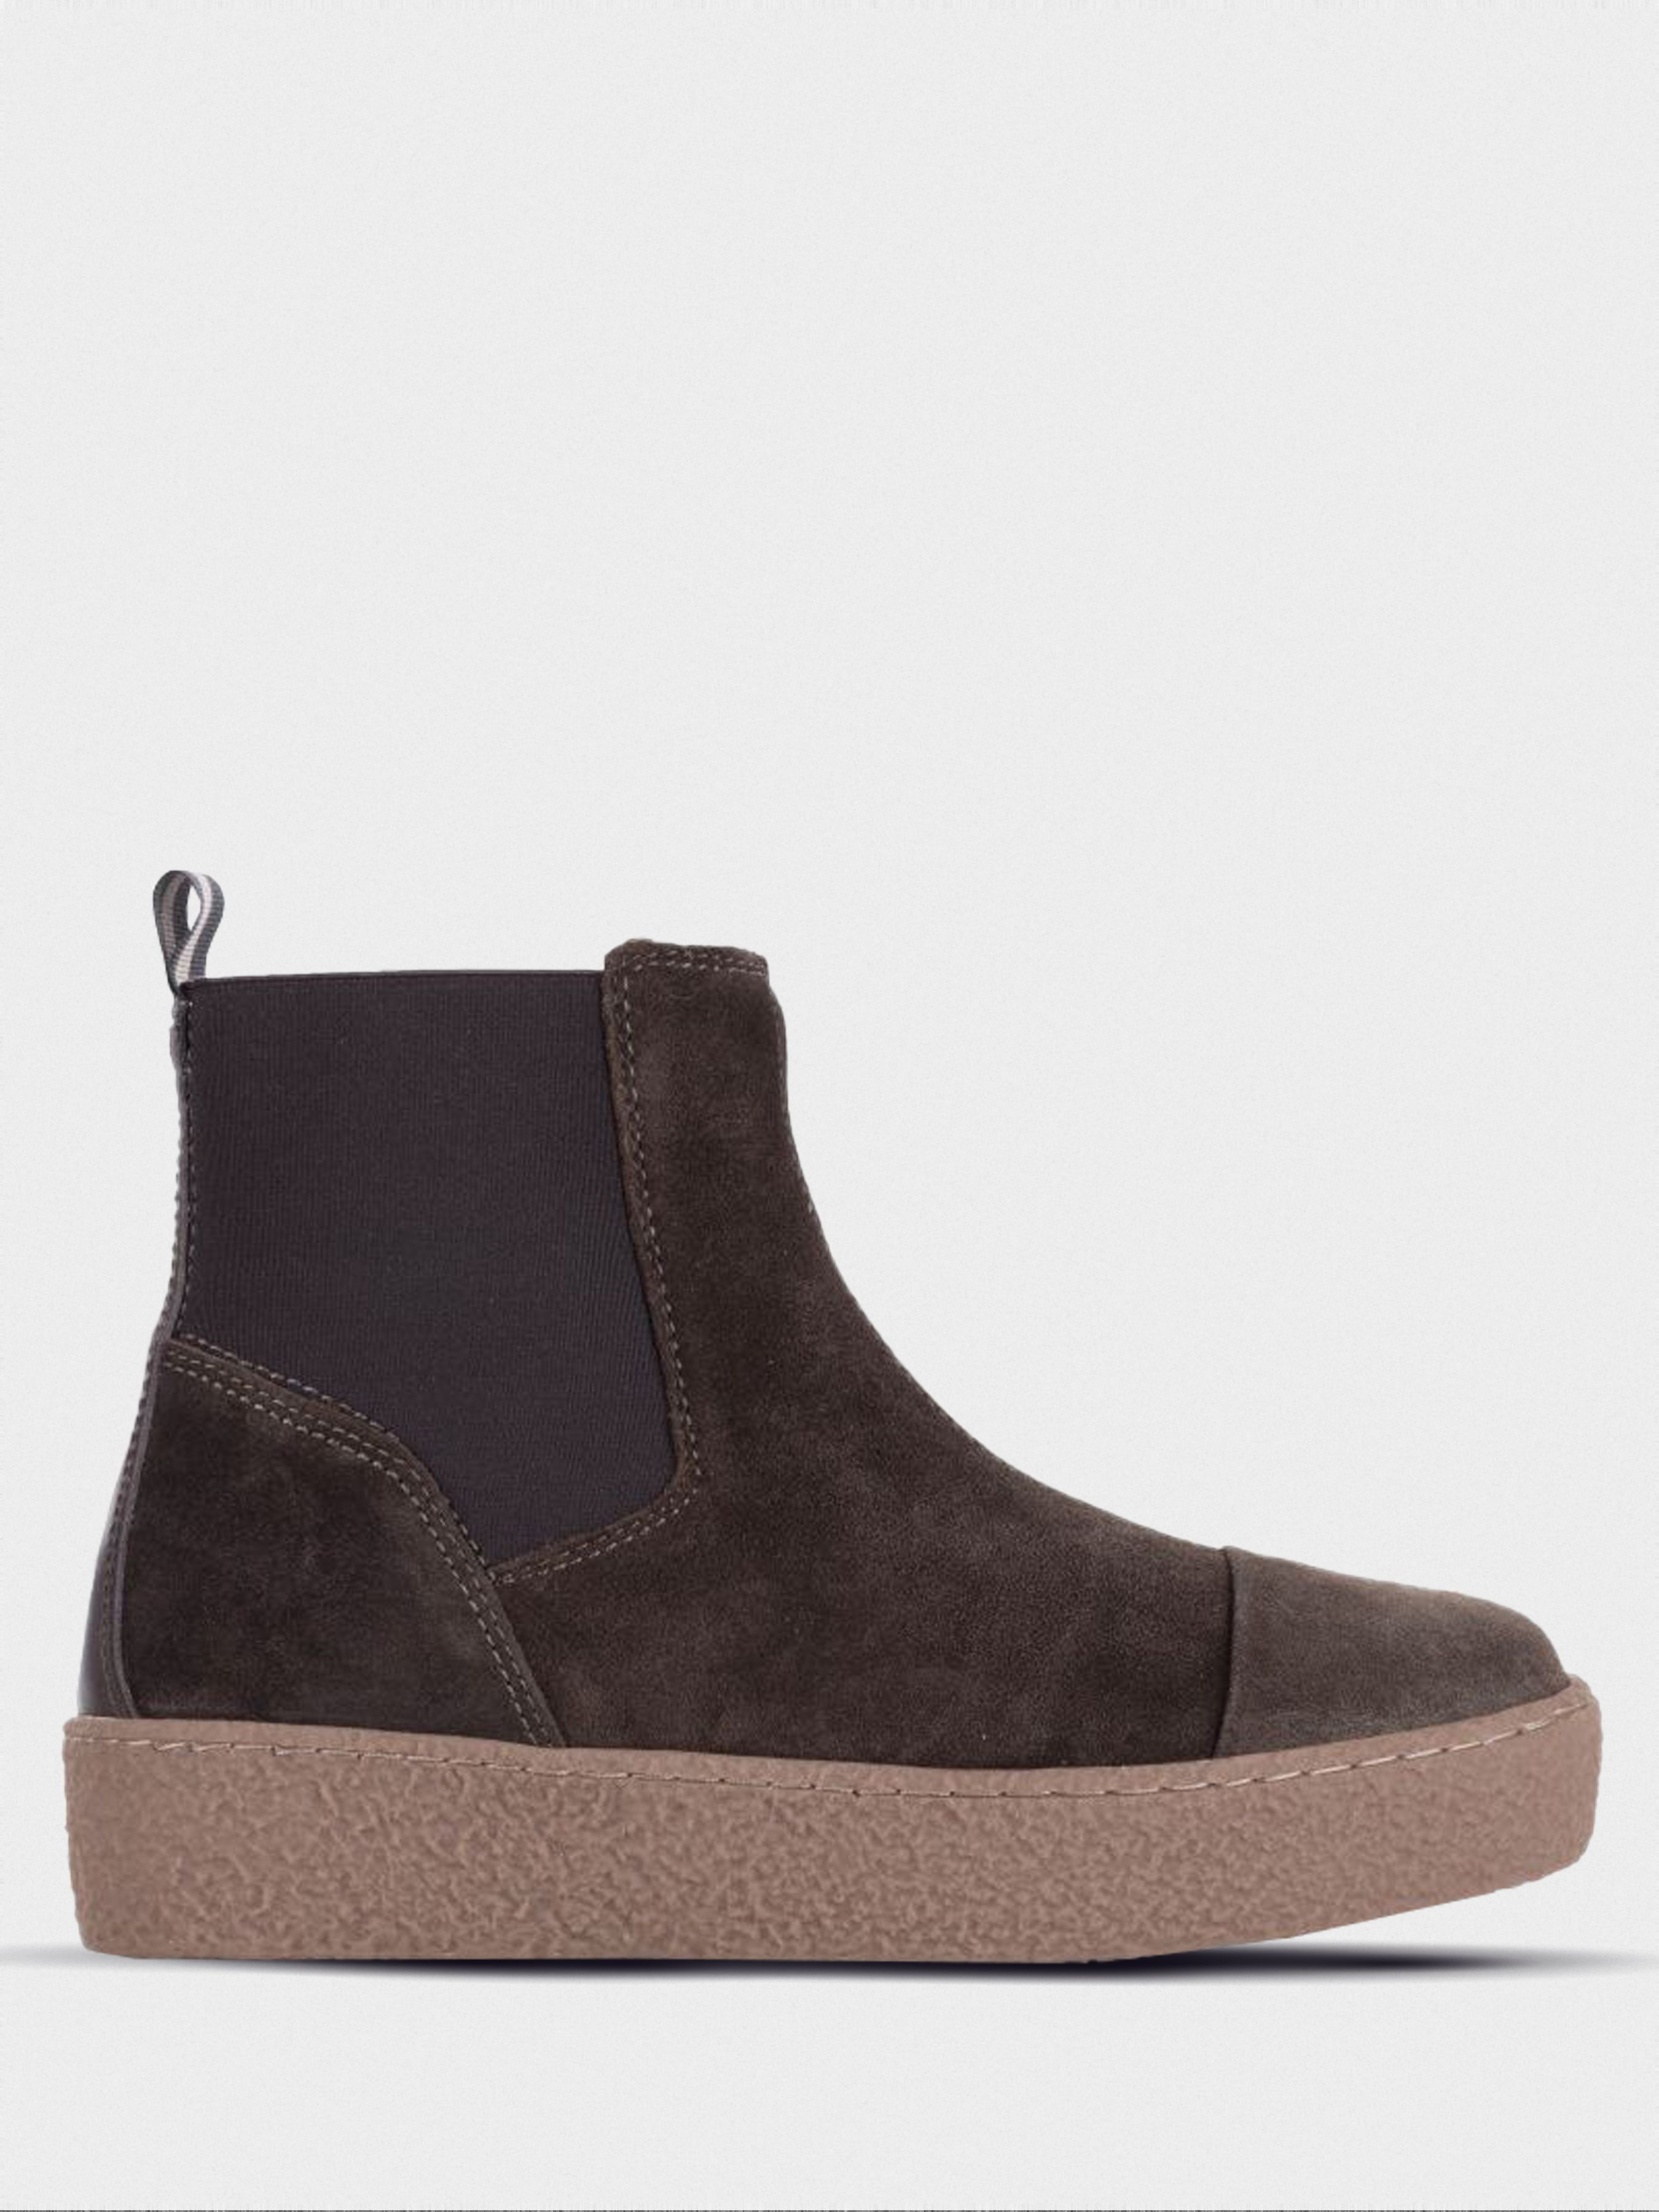 Ботинки женские MARC O'POLO PY959 размерная сетка обуви, 2017